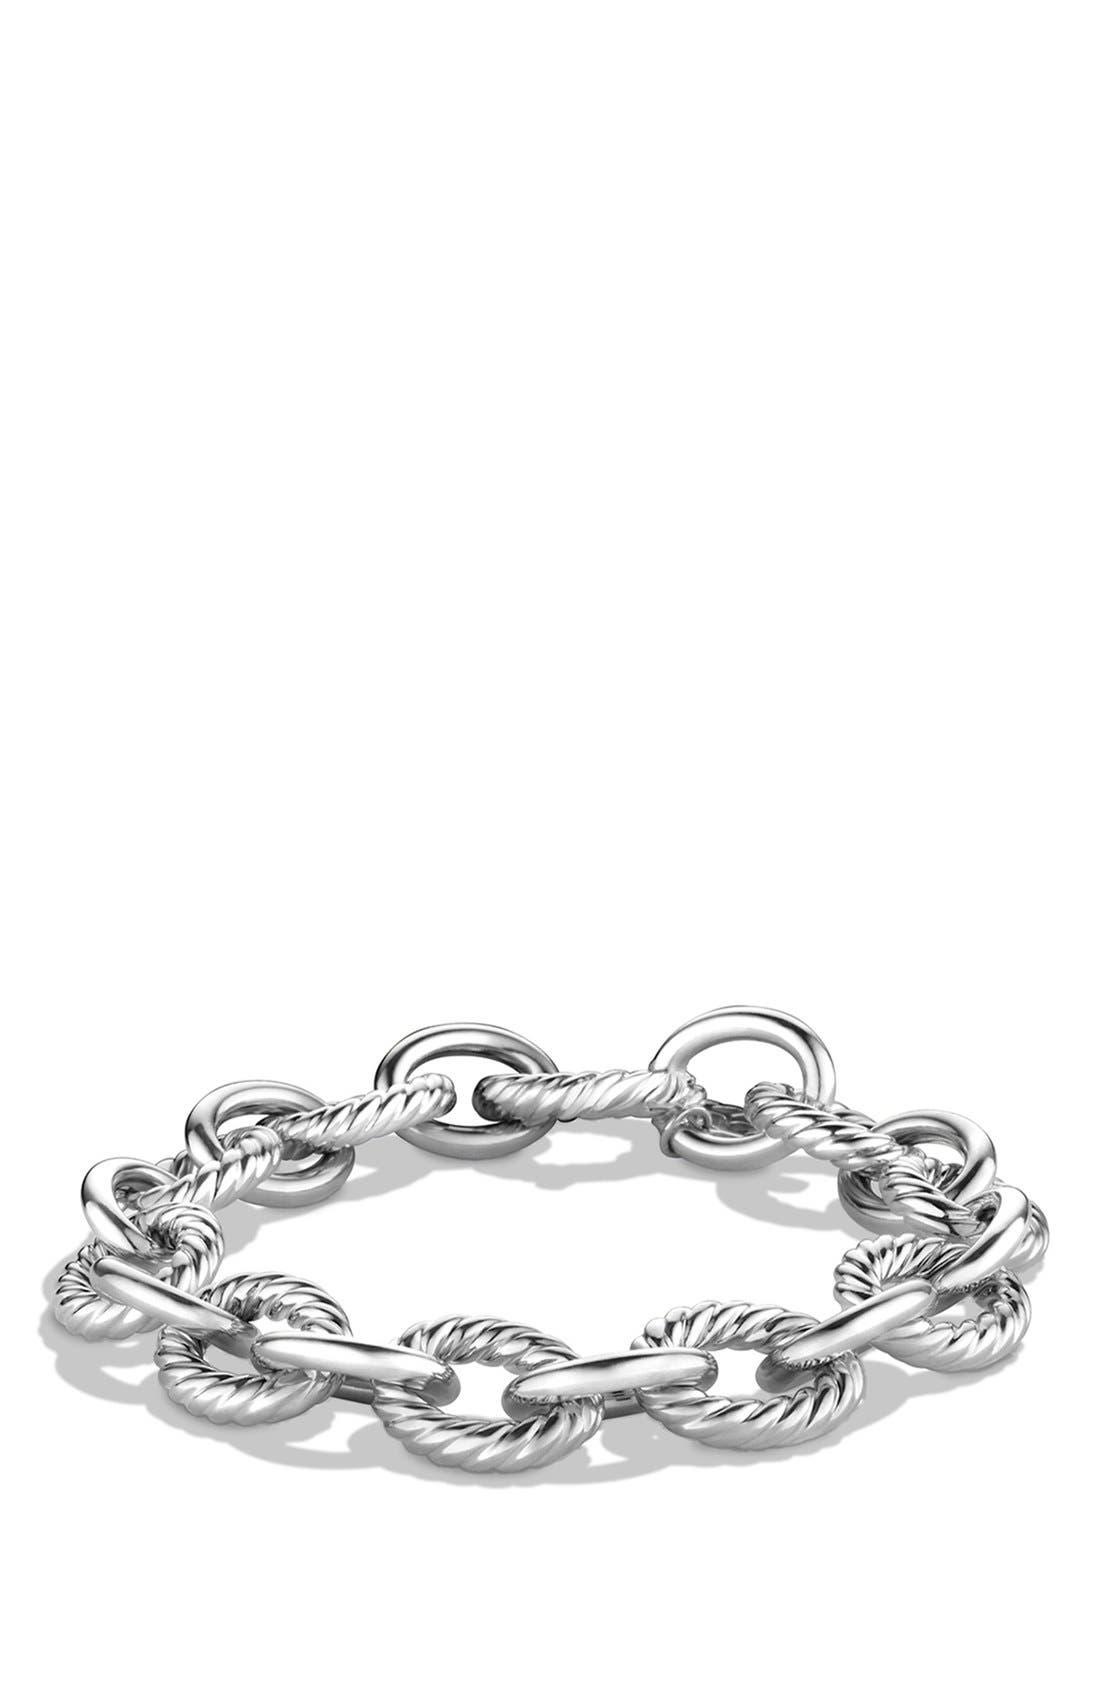 DAVID YURMAN 'Oval' Large Link Bracelet, Main, color, SILVER